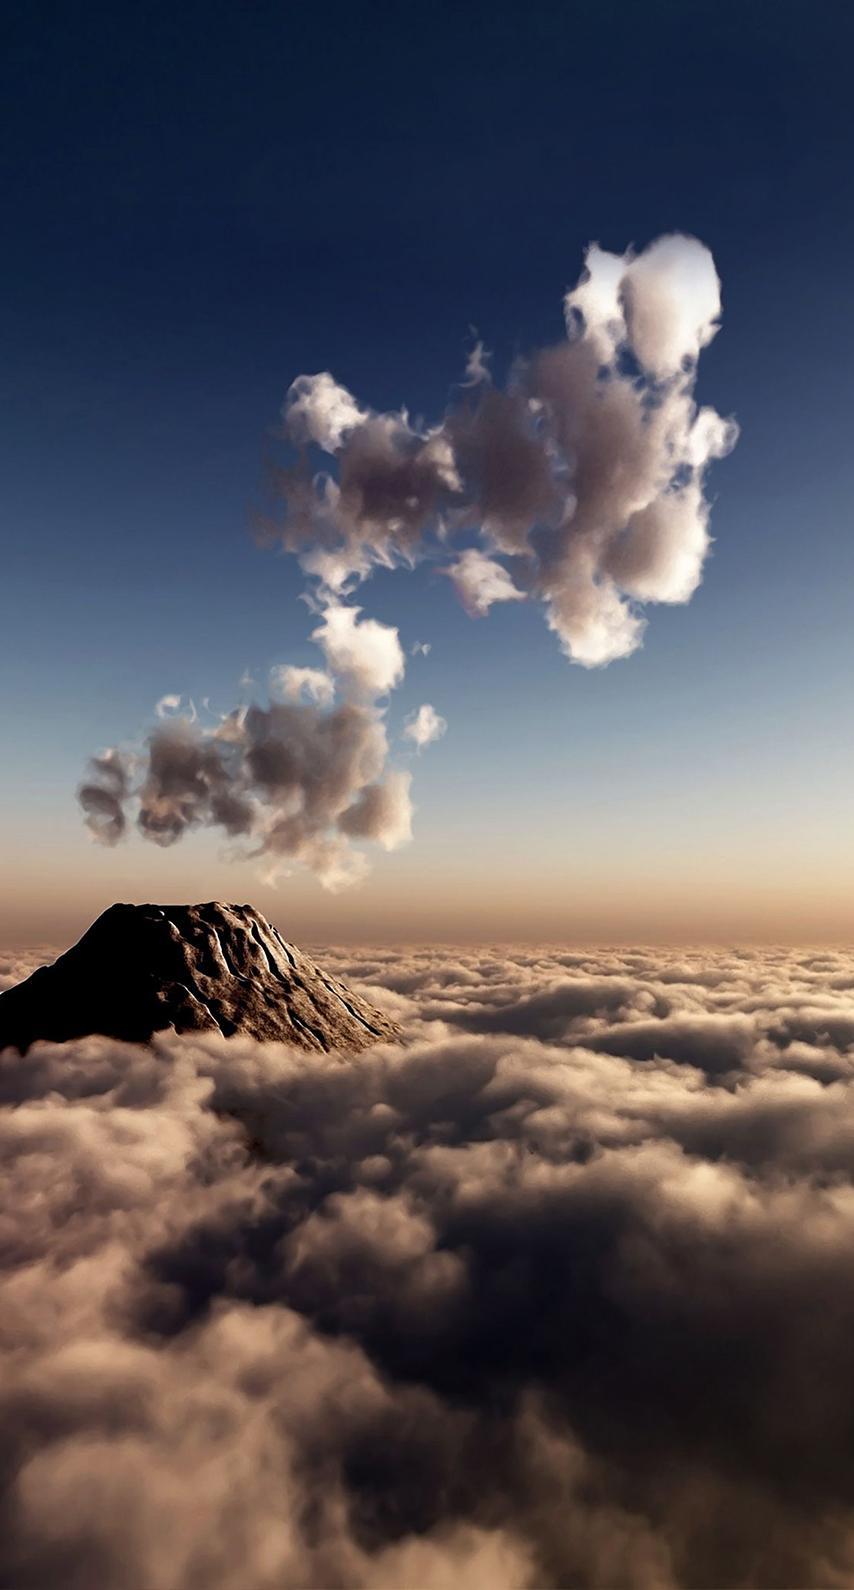 volcano, computer wallpaper, atmosphere of earth, calm, sunlight, meteorological phenomenon, daytime, cumulus